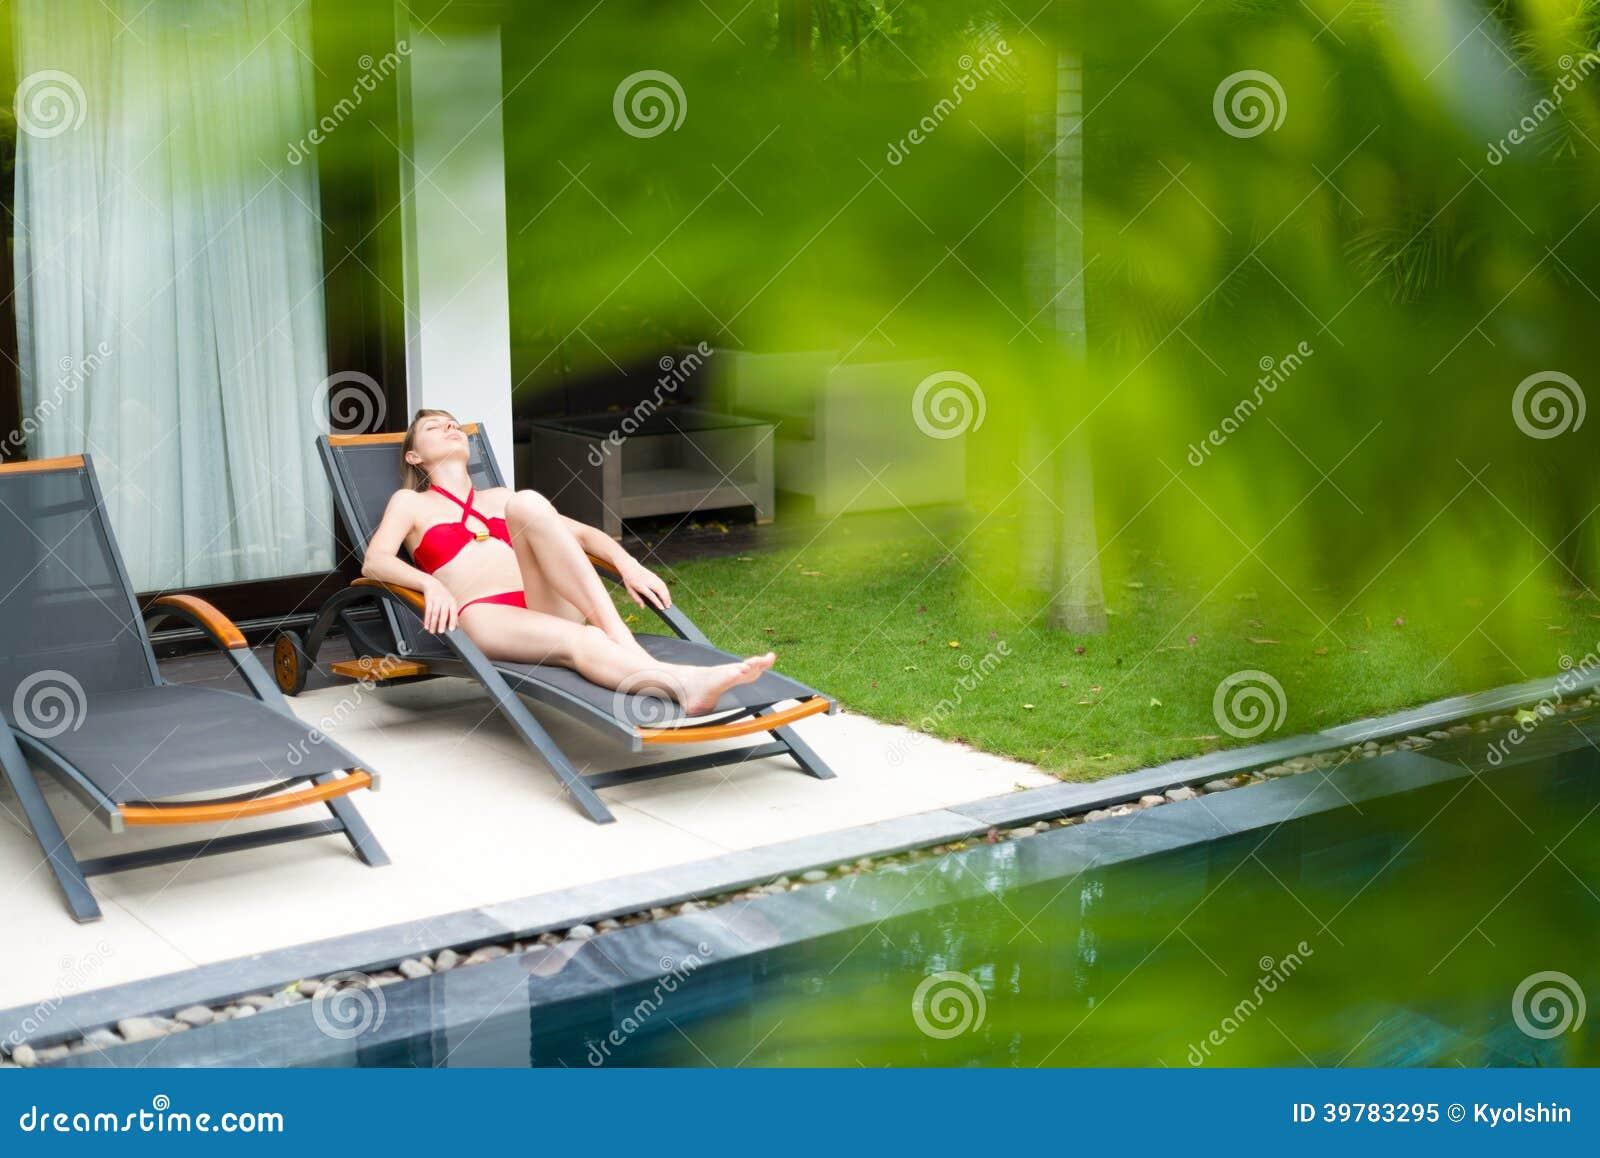 Kobieta relaksuje na bryczki longue pobliskim basenie.